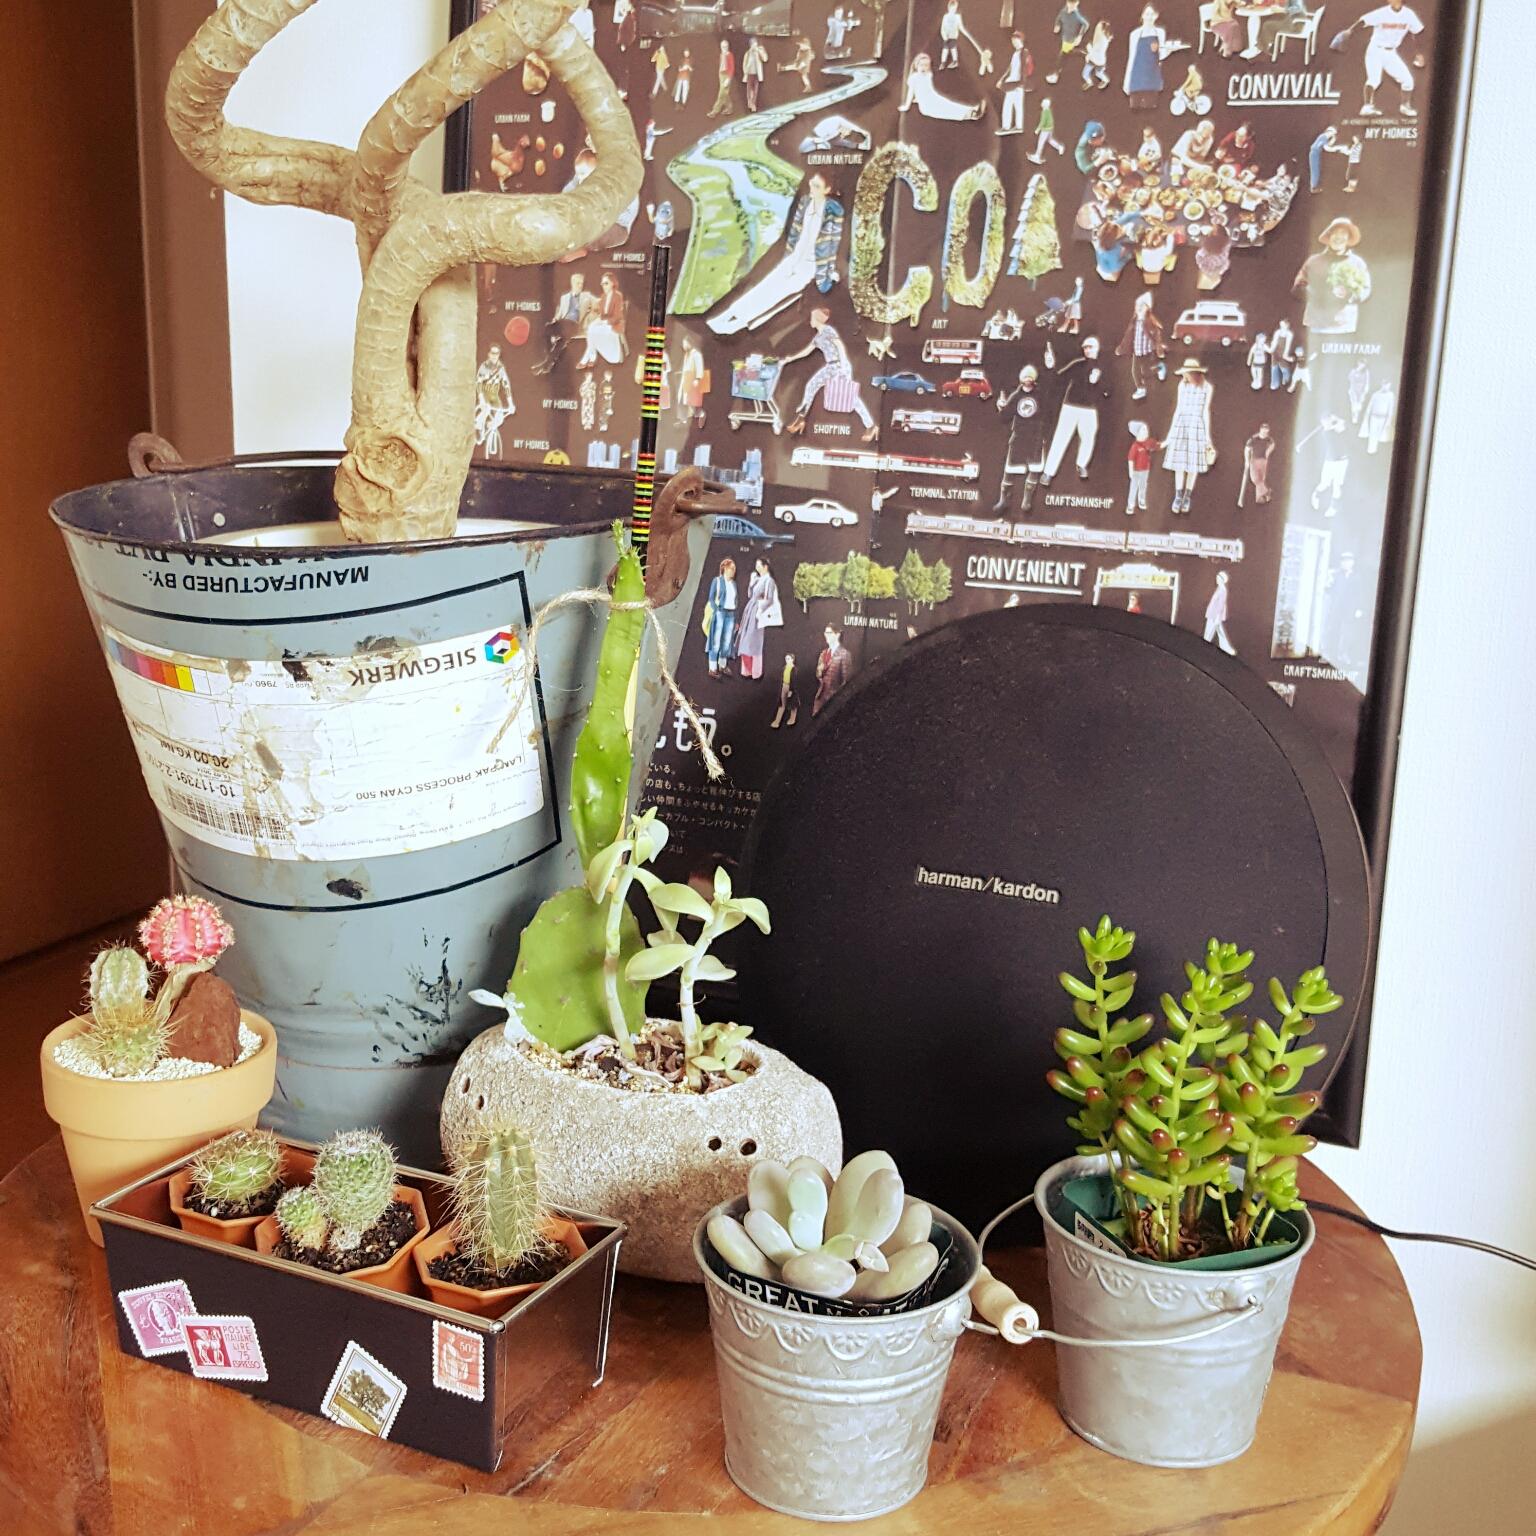 My Desk/サボテン/多肉植物/セリア/カフェ/100円ショップ/コンシンネ/カフェ風インテリアを目指してに関連する部屋のインテリア実例